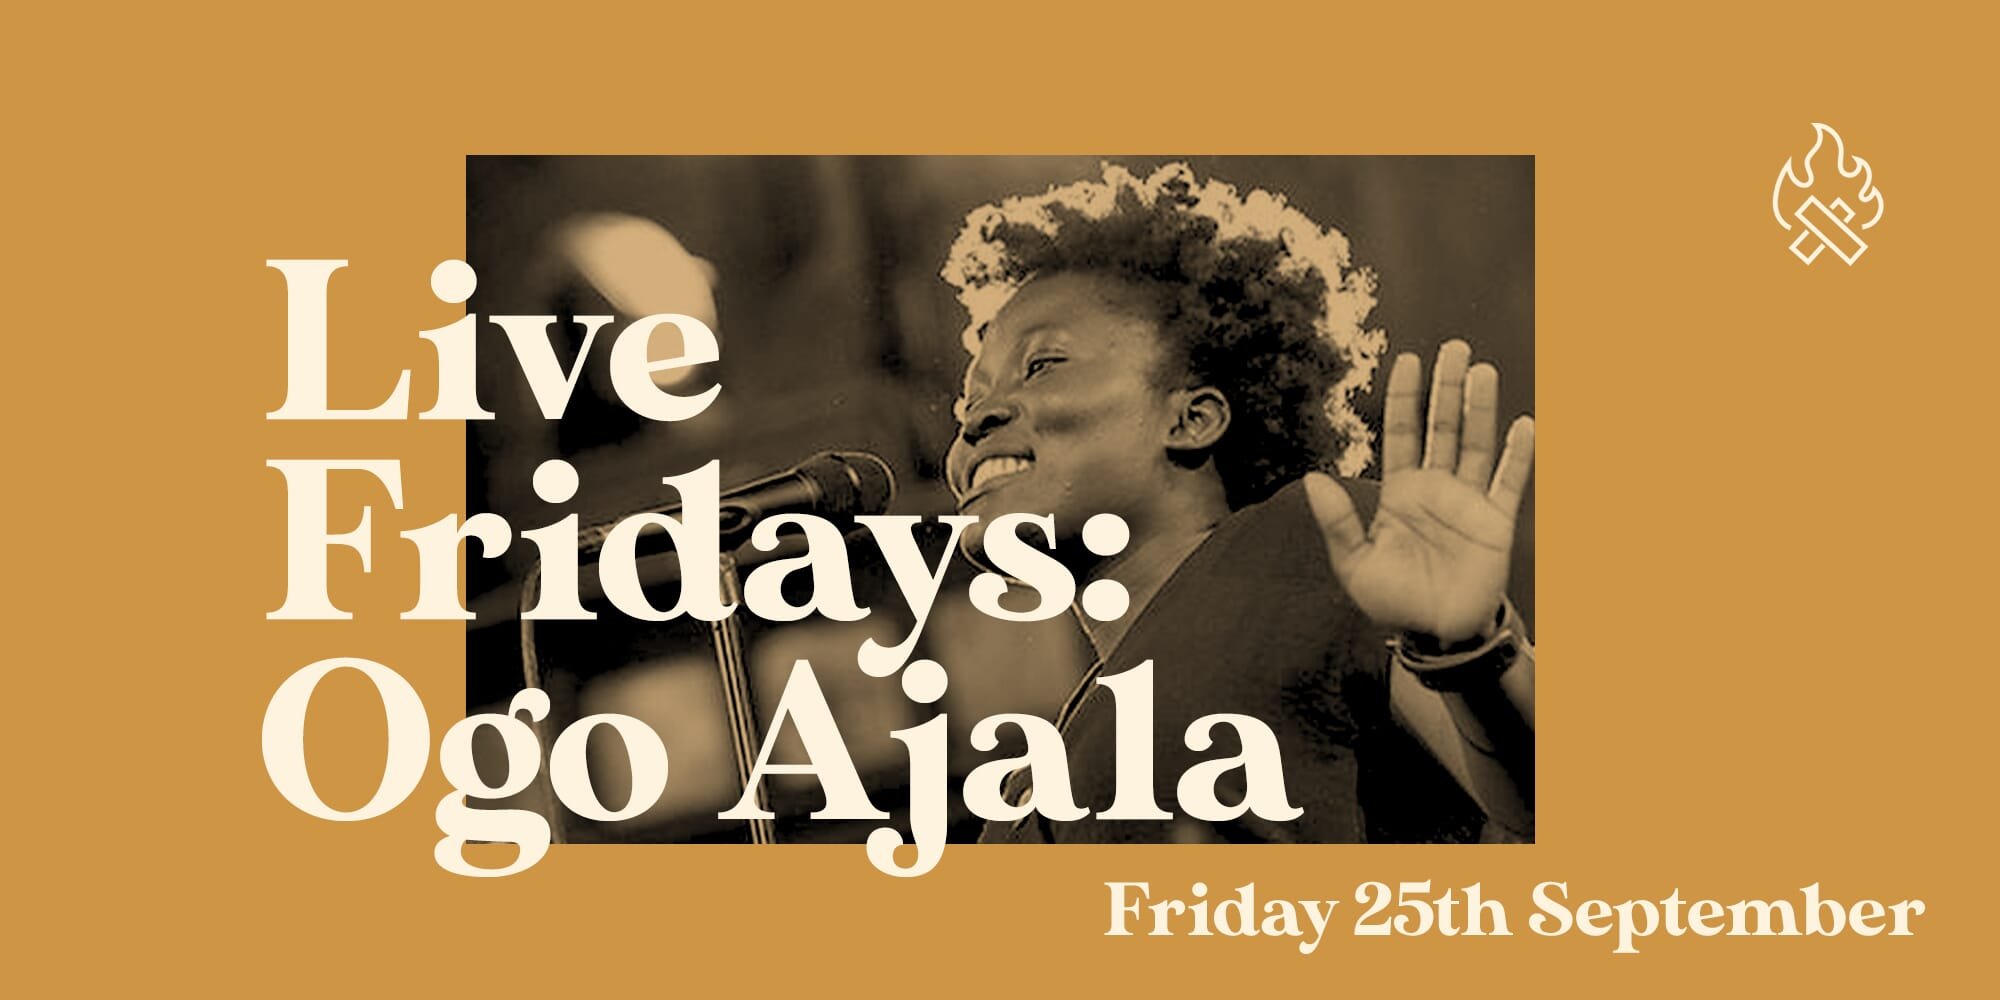 Live Fridays Ogo III